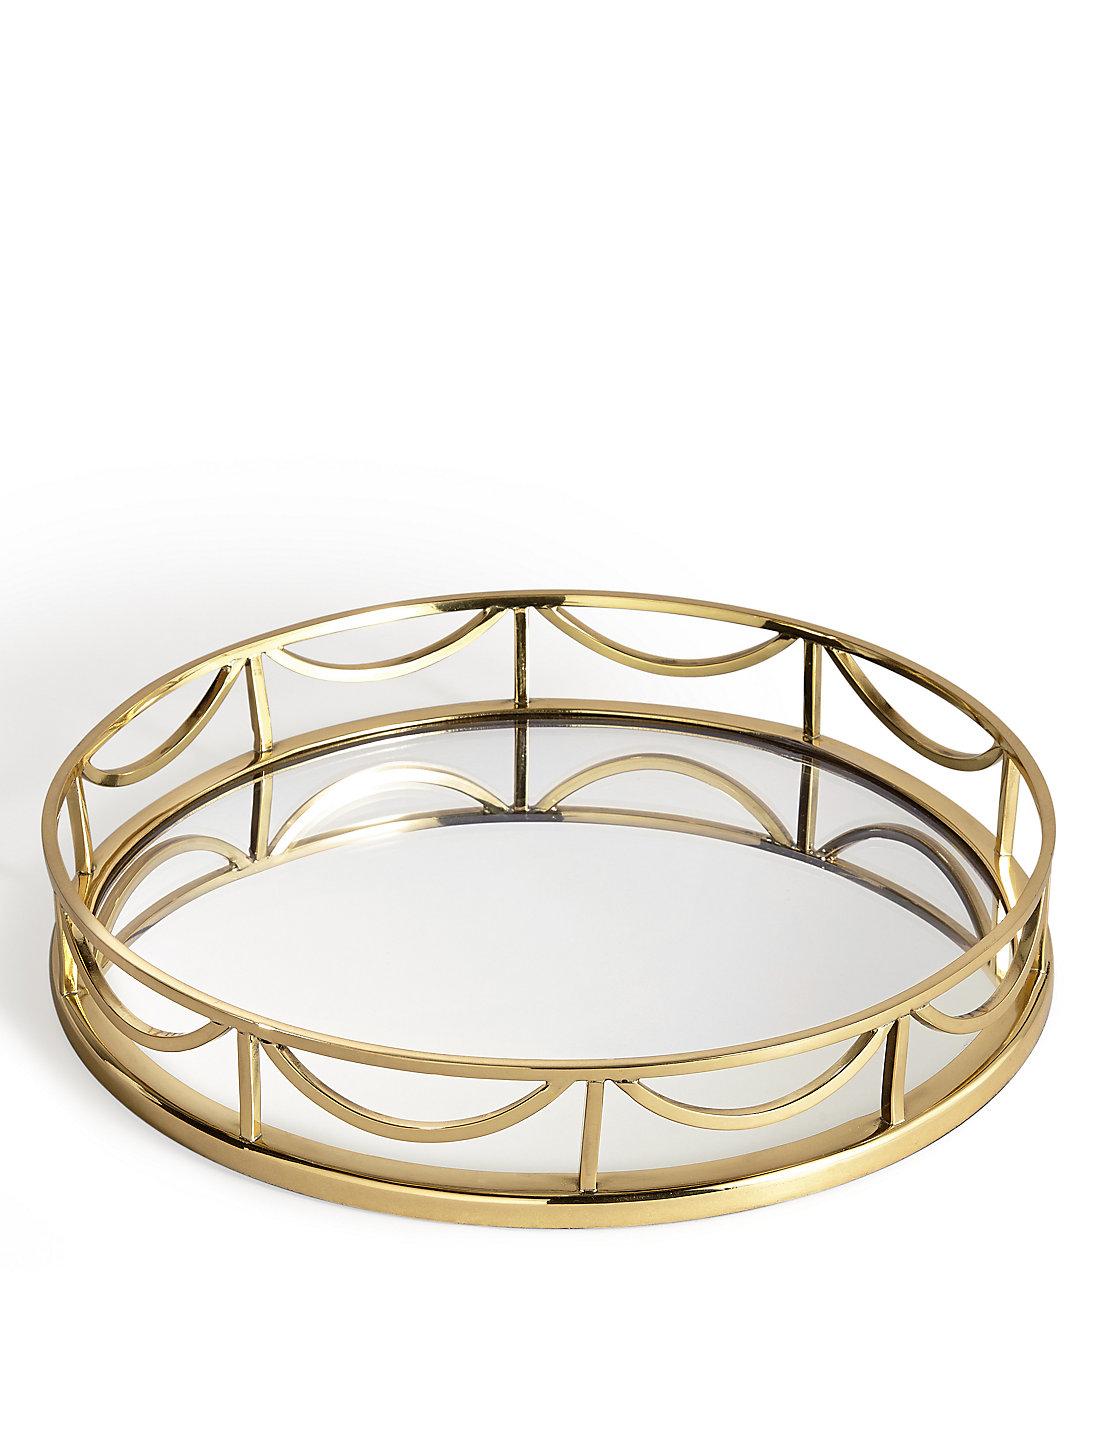 Round Mirrored Tray Uk Mirror Designs